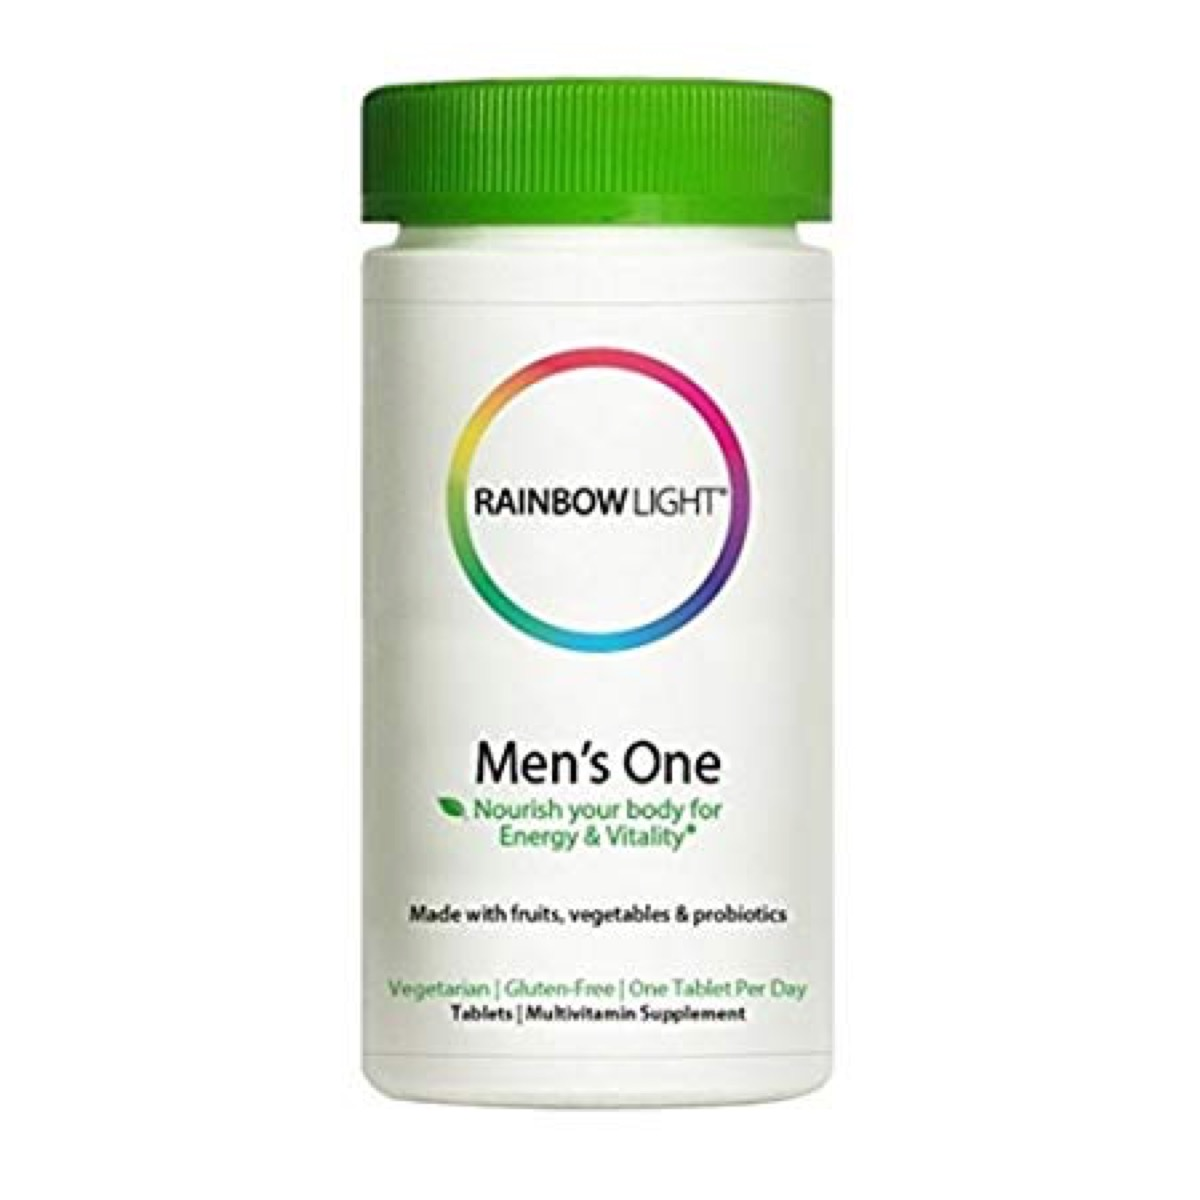 rainbow light, best multivitamin for men